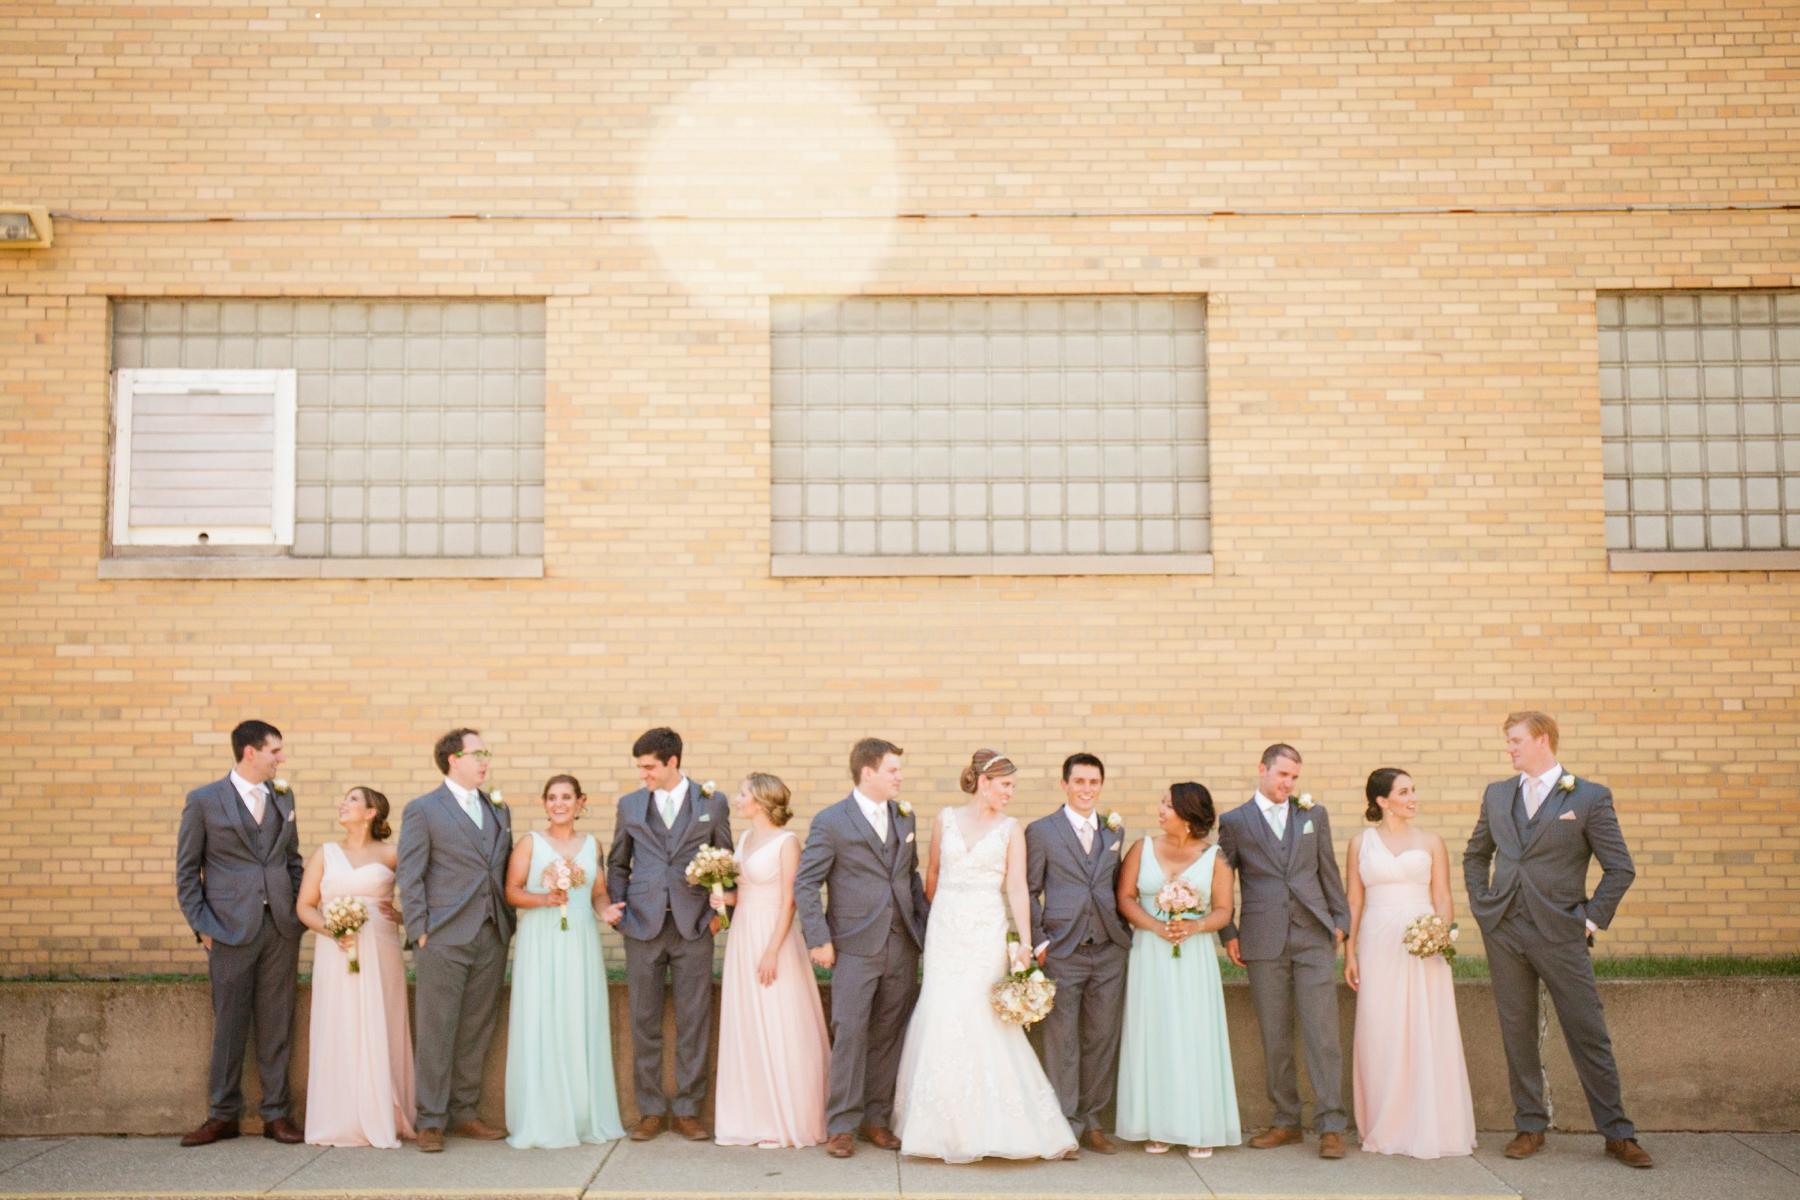 Ben_Jillian_Midland_Baycity_Wedding_0064.jpg